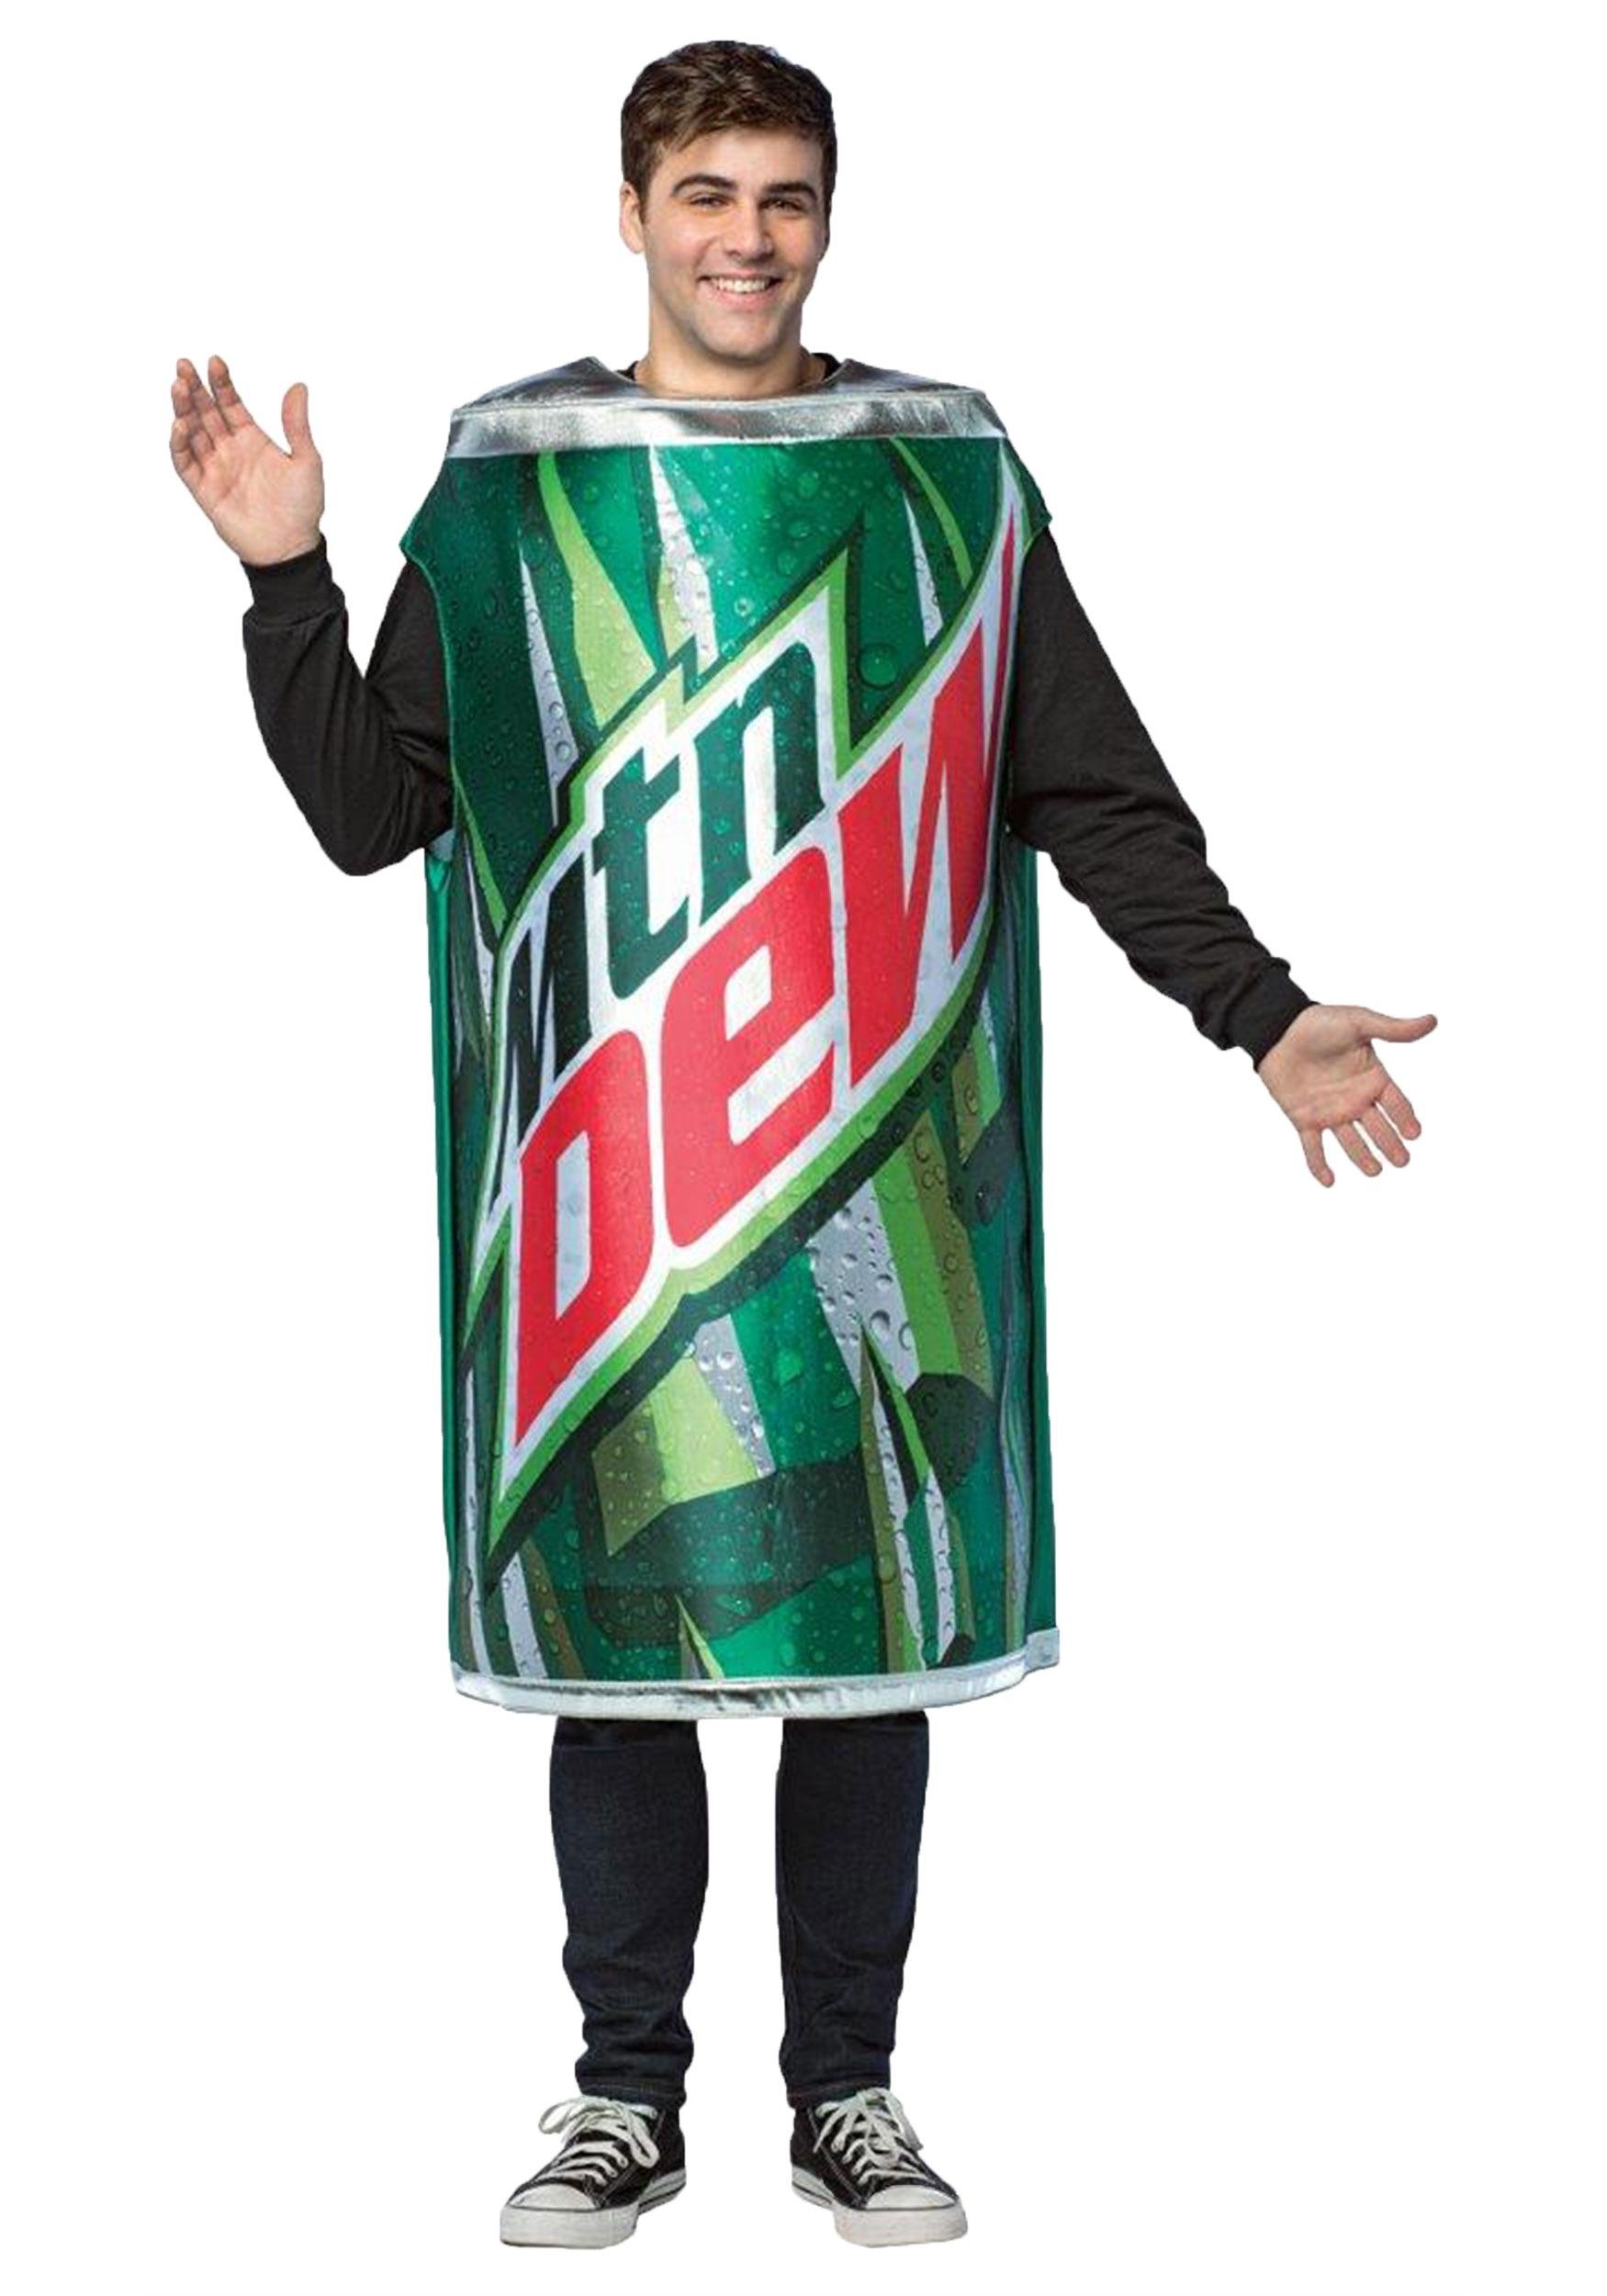 6e44bda1 -mountain-dew-can-costume.jpg